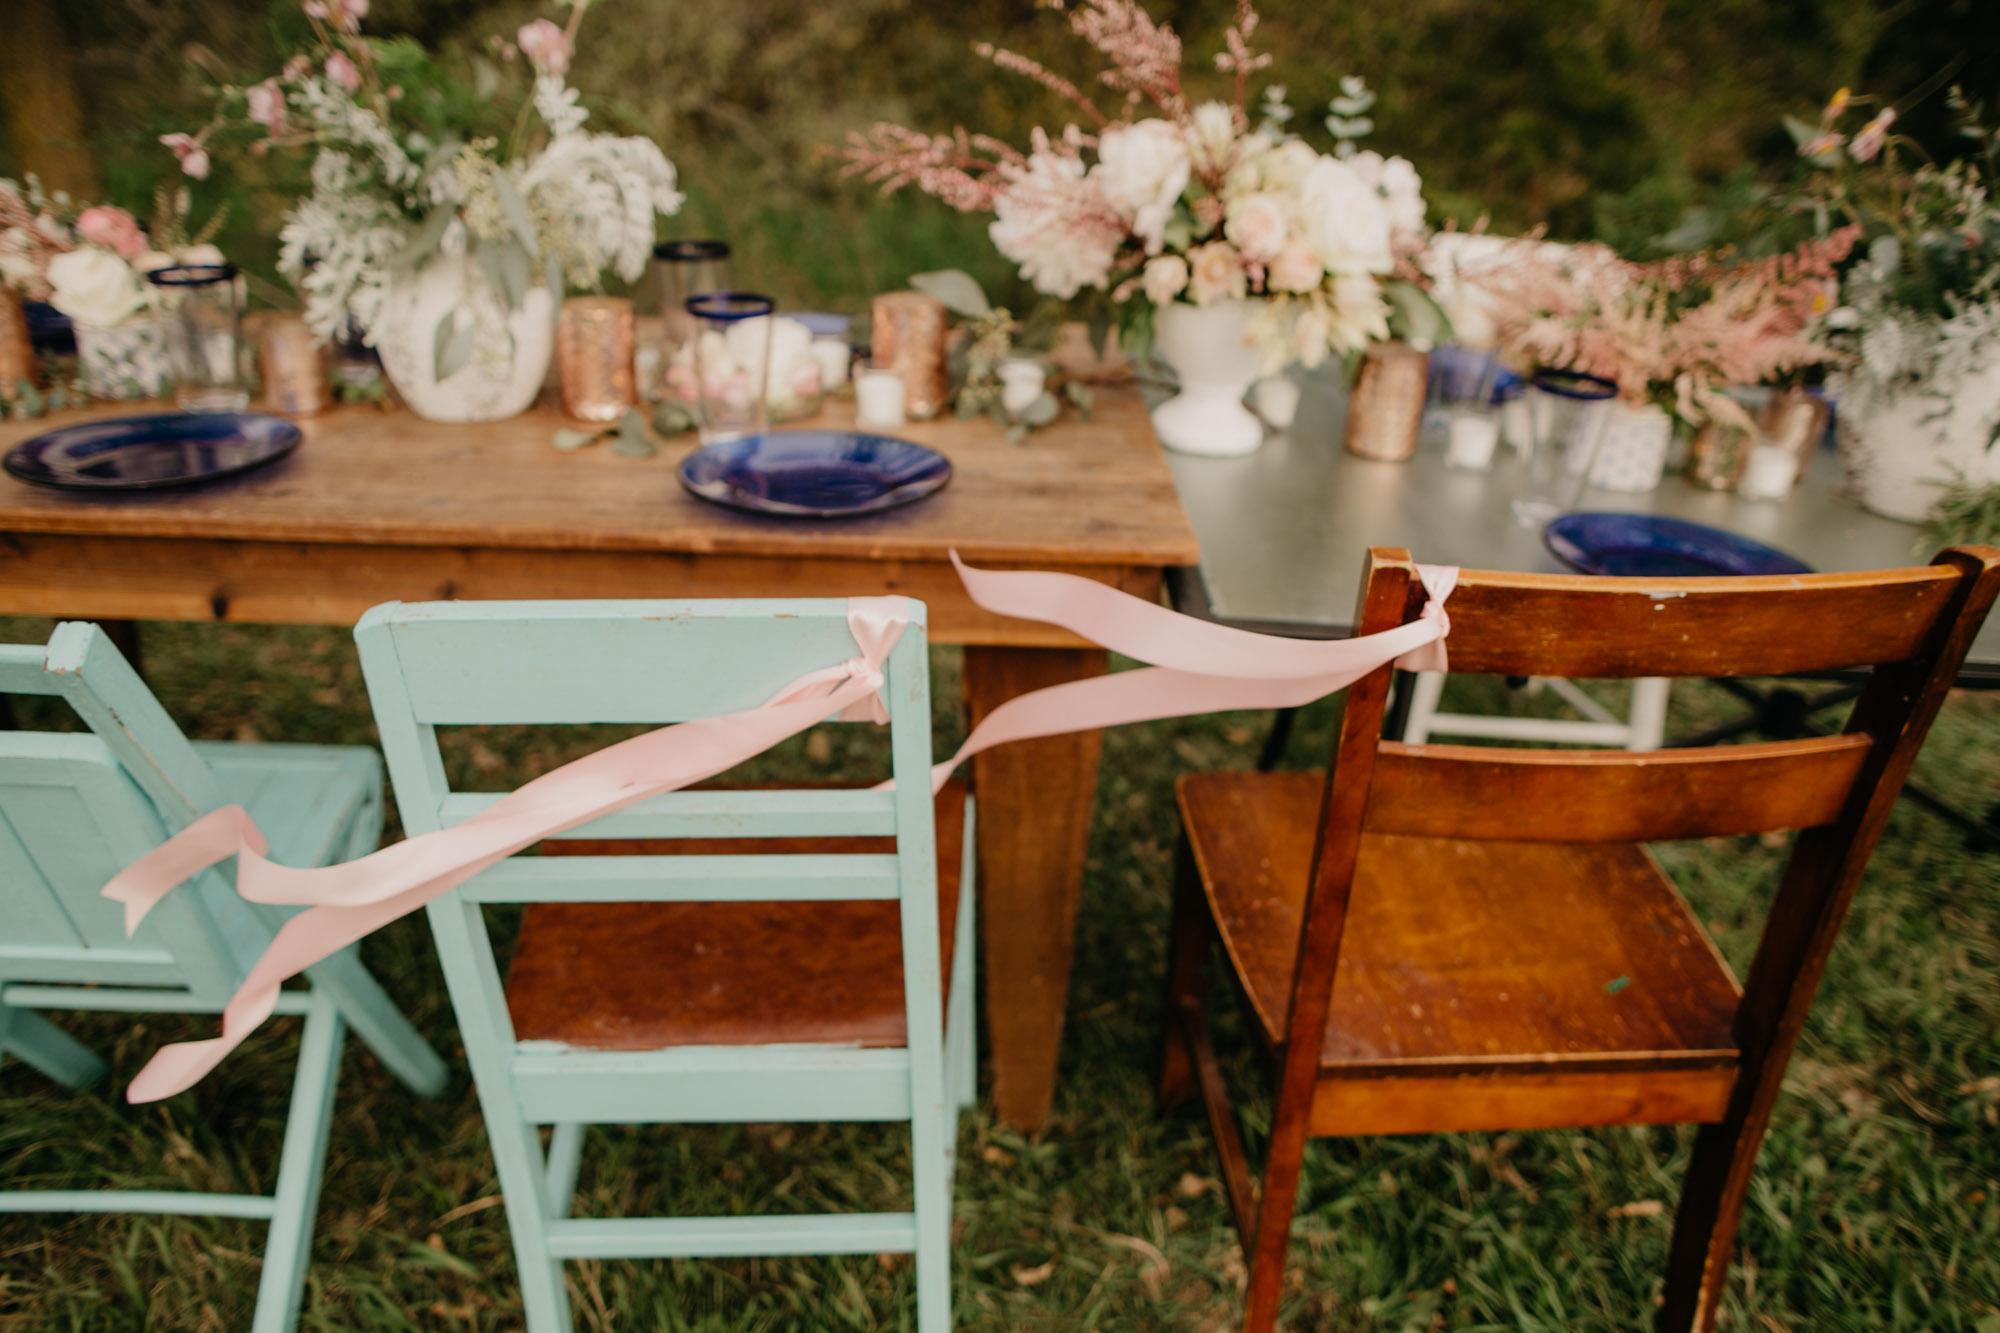 omaha-wedding-photographer-meghan-time-31.jpg